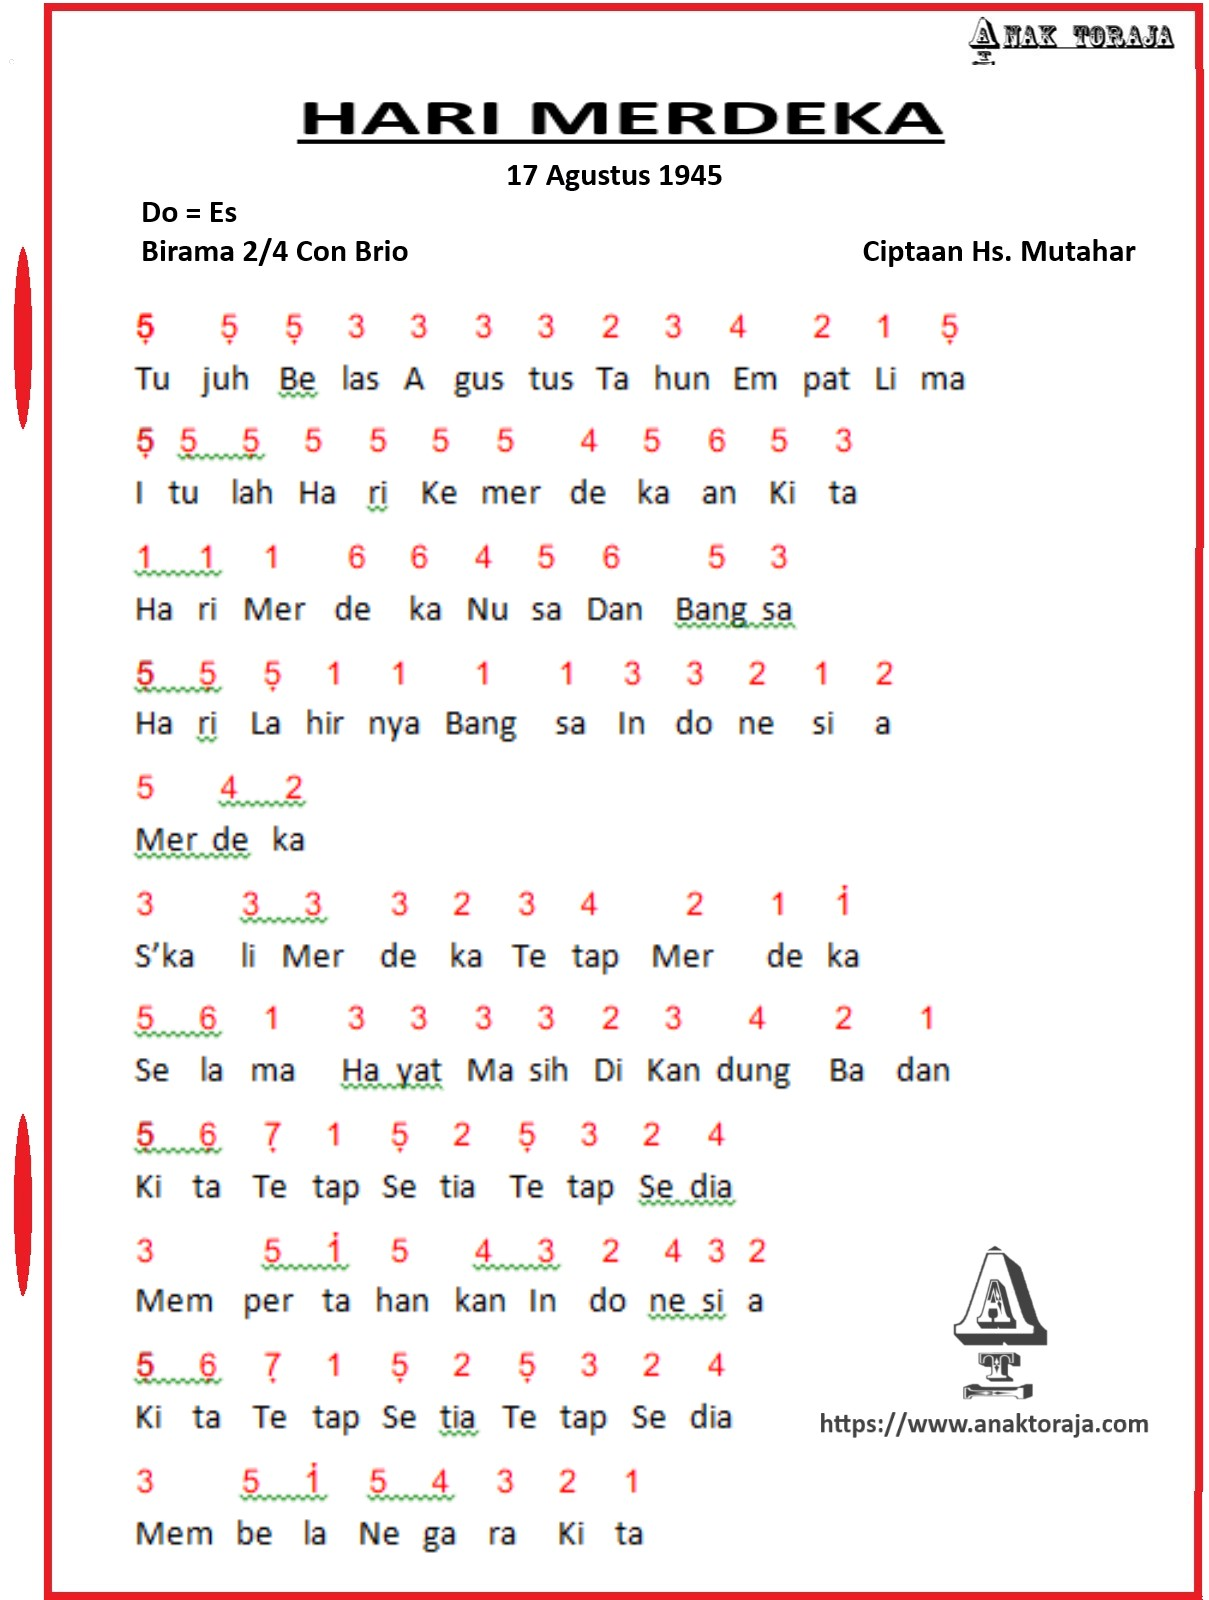 Birama Hari Merdeka : birama, merdeka, Angka, Agustus, (Hari, Merdeka)